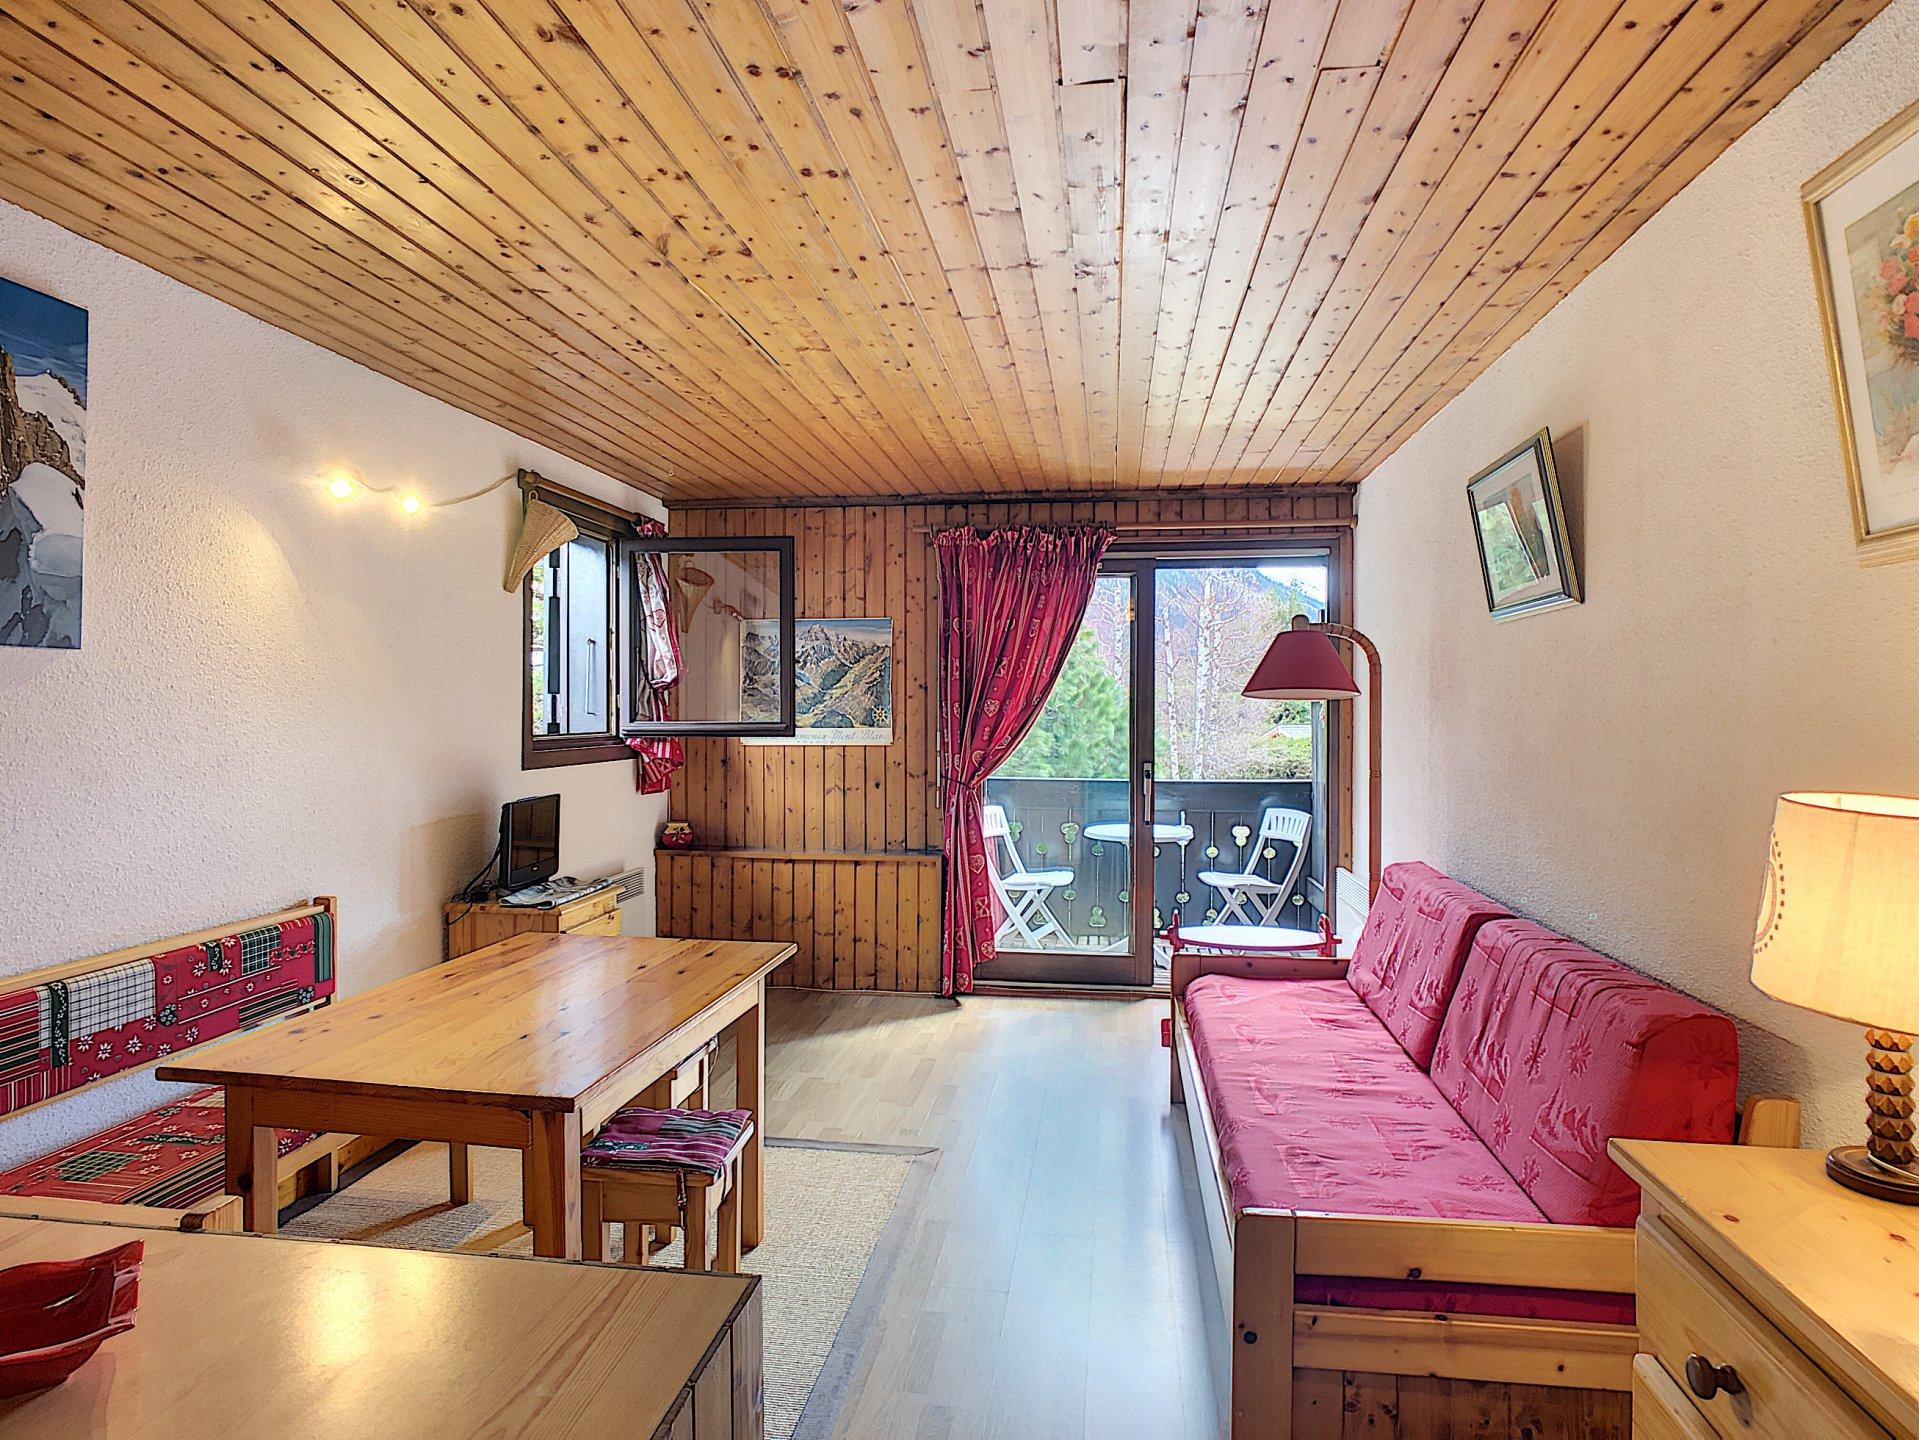 1 bedroom apartment, Chamonix Les Praz